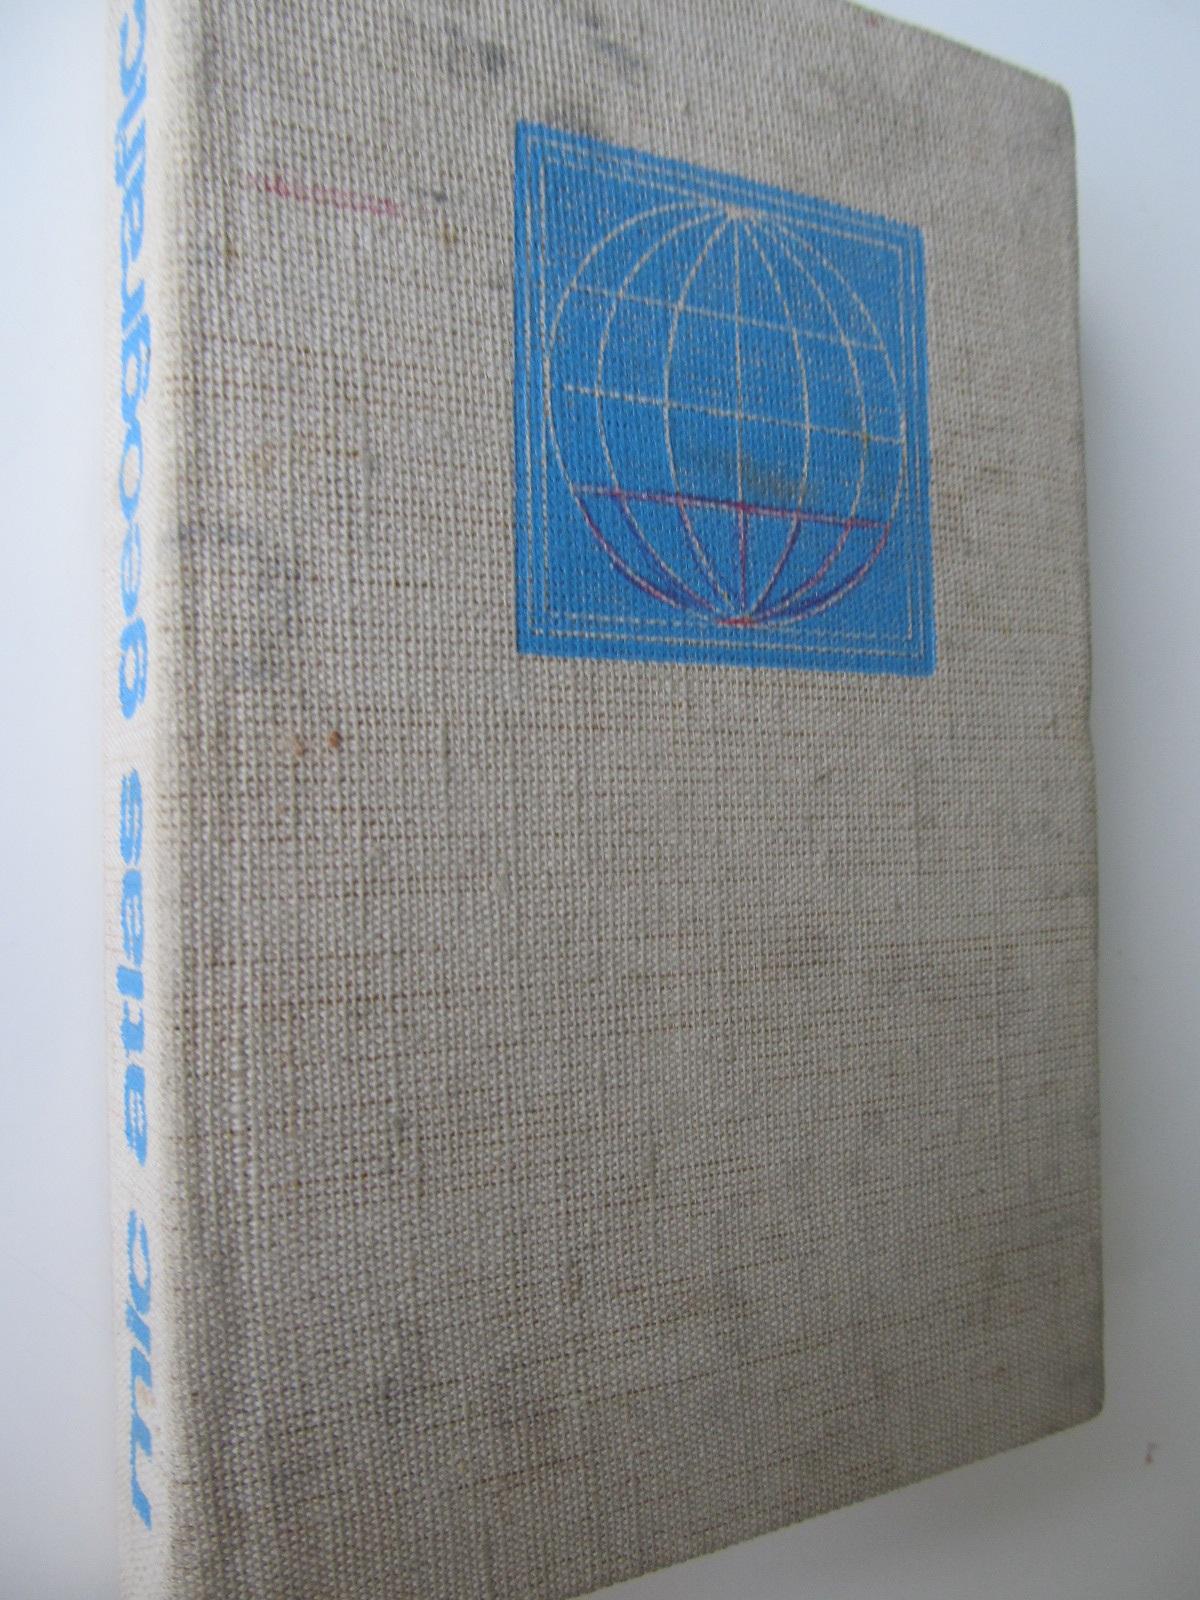 Mic atlas geografic - A. Barsan | Detalii carte